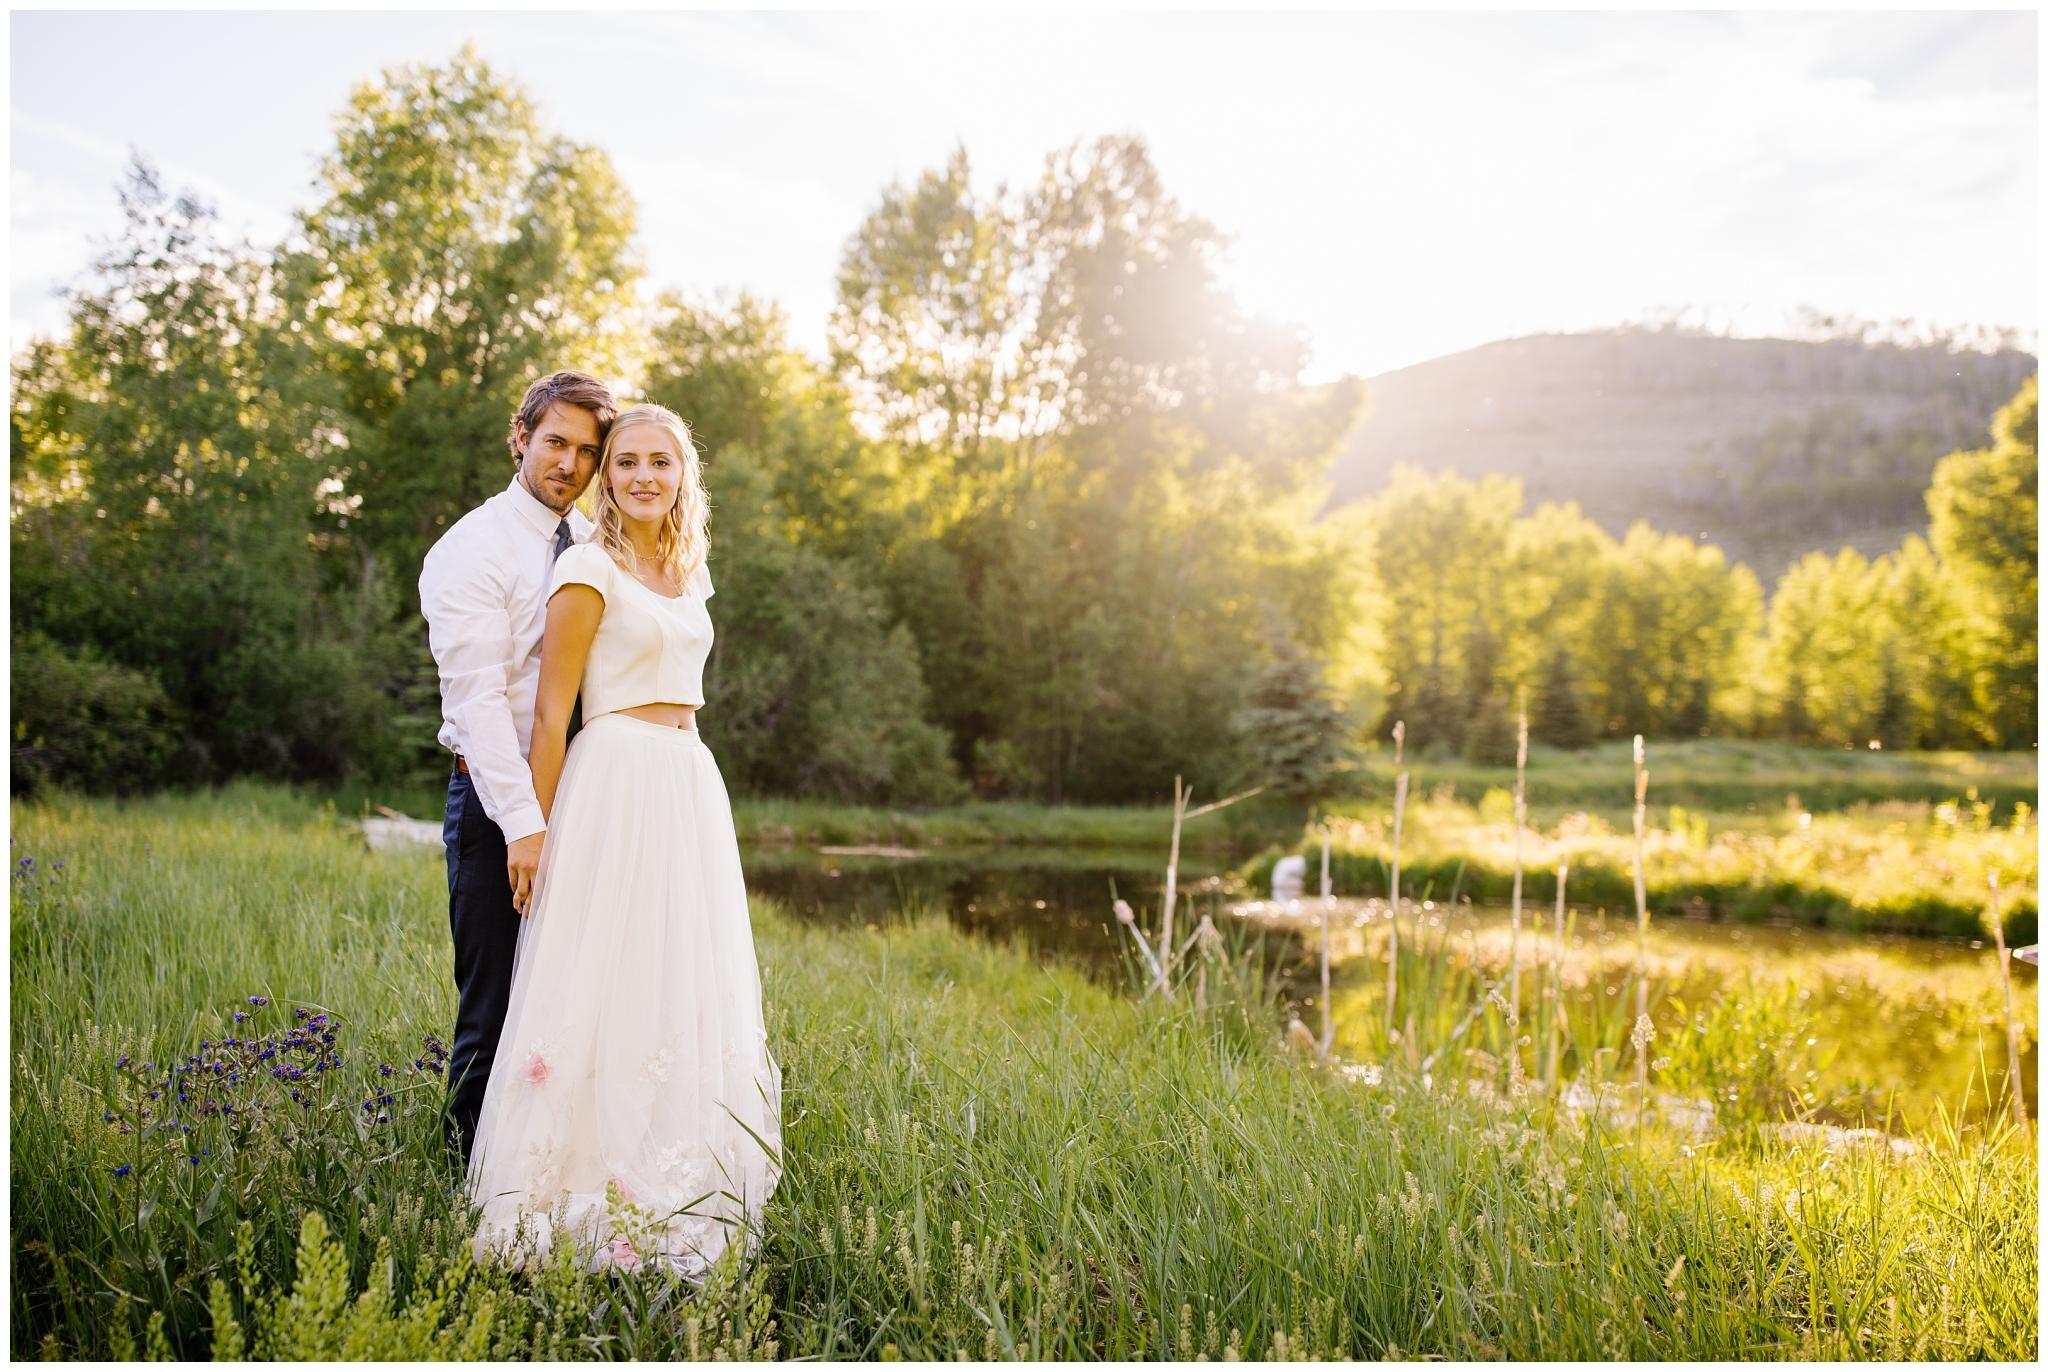 Lizzie-B-Imagery-Utah-Wedding-Photographer-Park-City-Photographer_0038.jpg